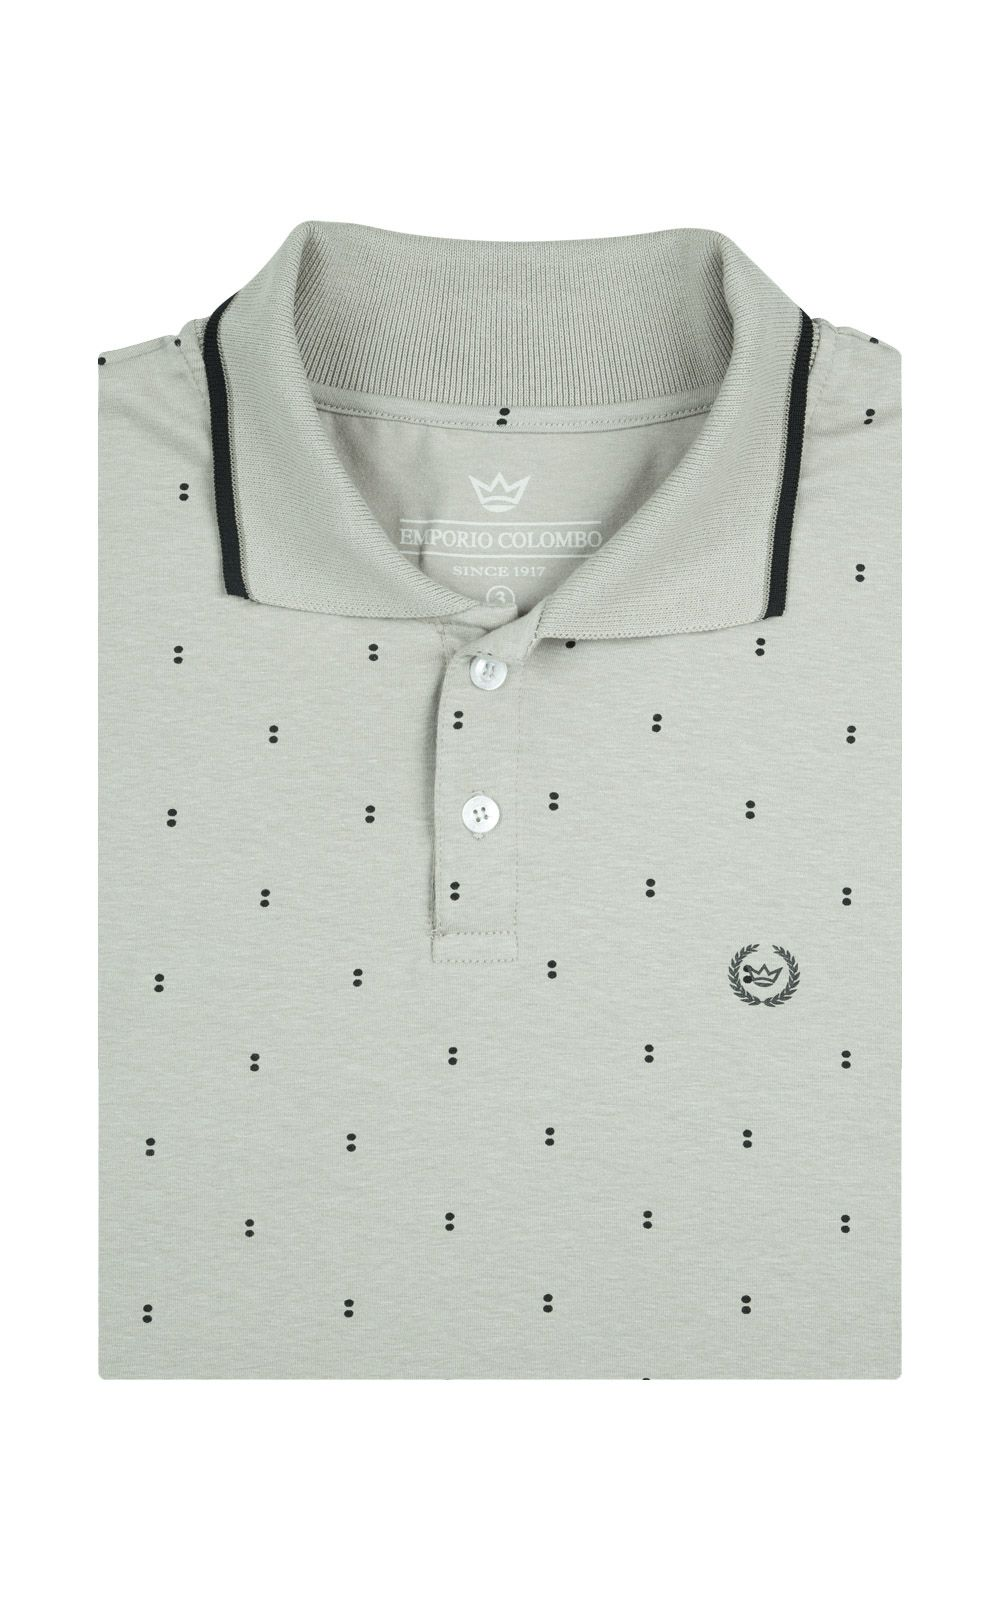 Foto 4 - Camisa Polo Masculina Cinza Estampada